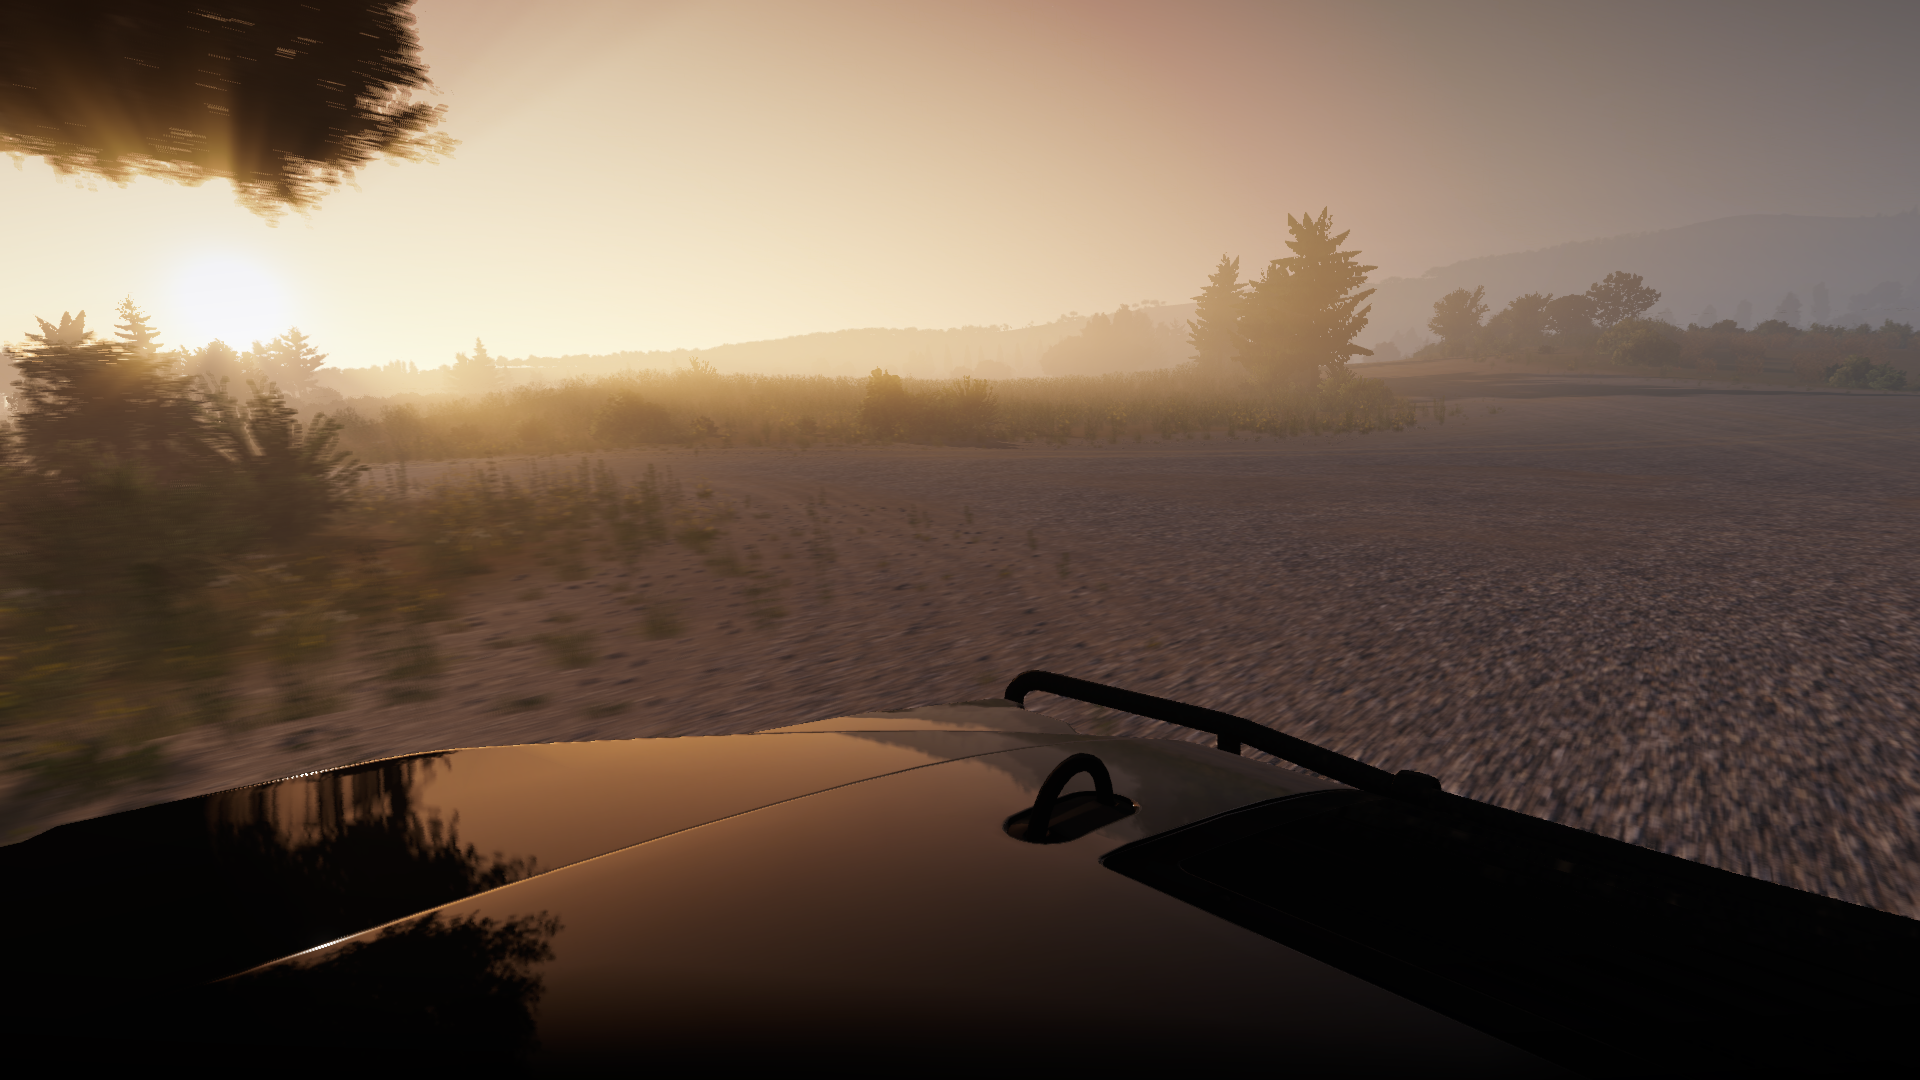 screenshot-original30dqout.png